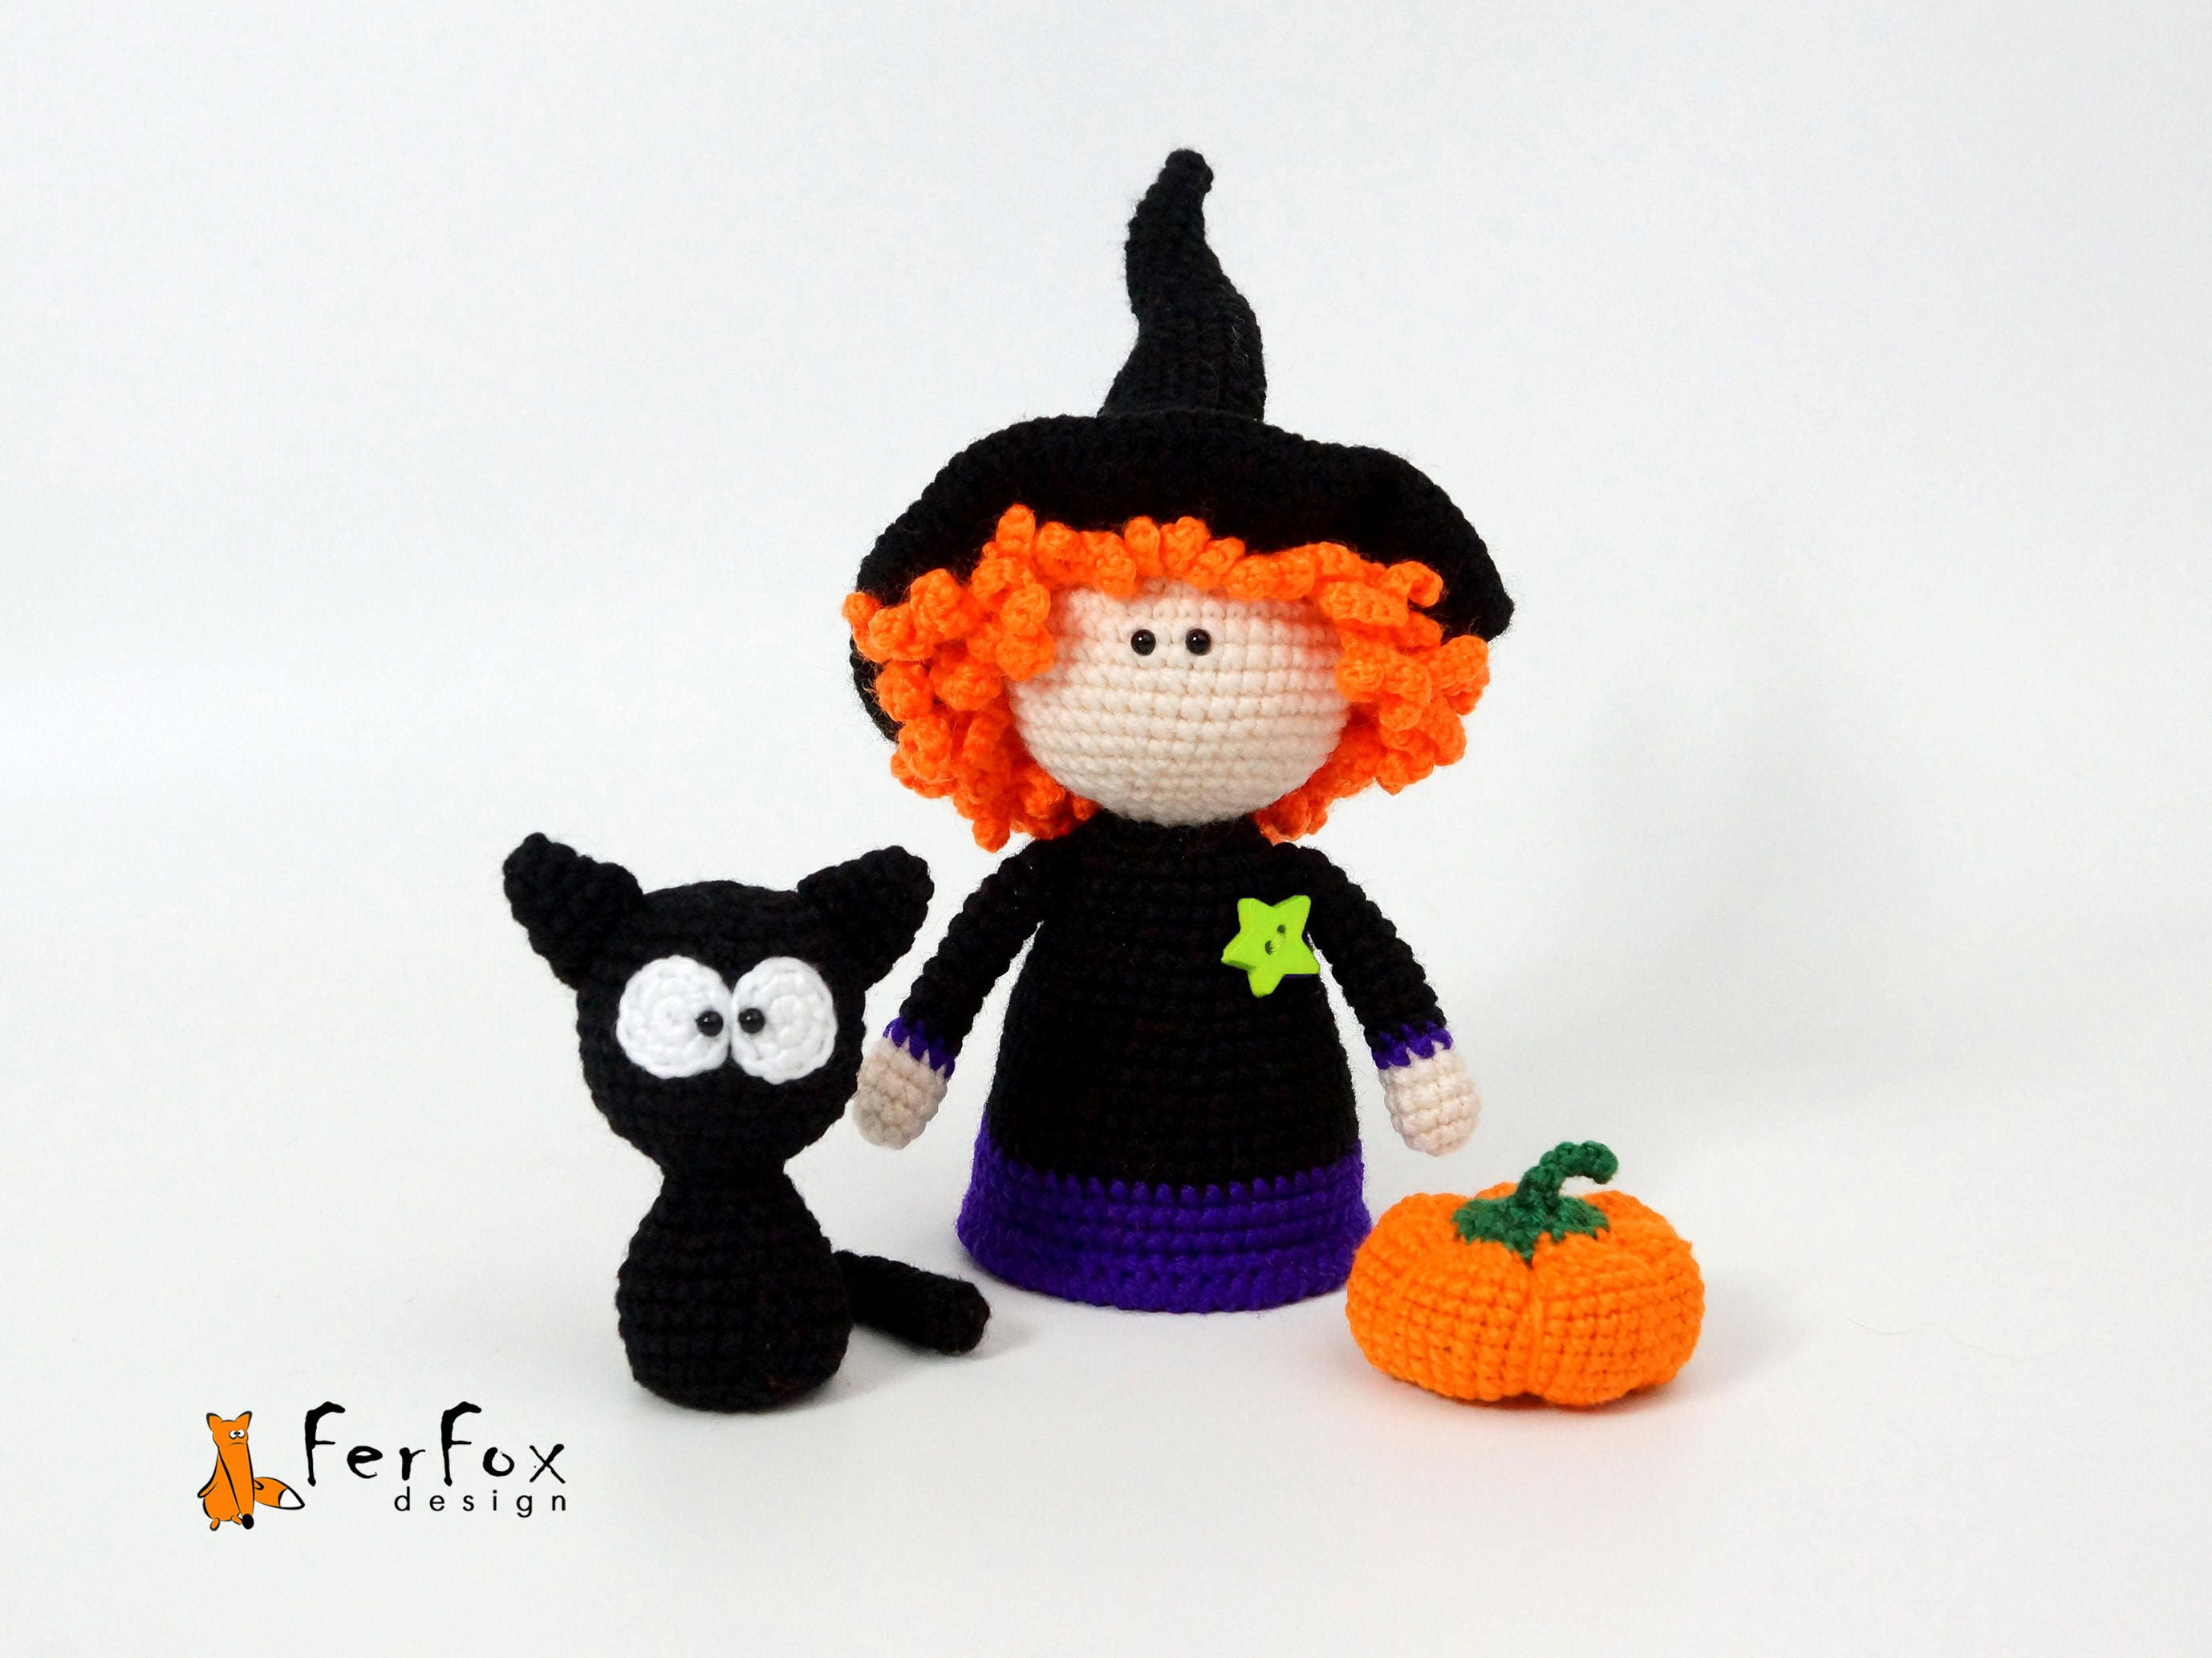 Witch doll Black cat Pumpkin Halloween decor Witch figurine